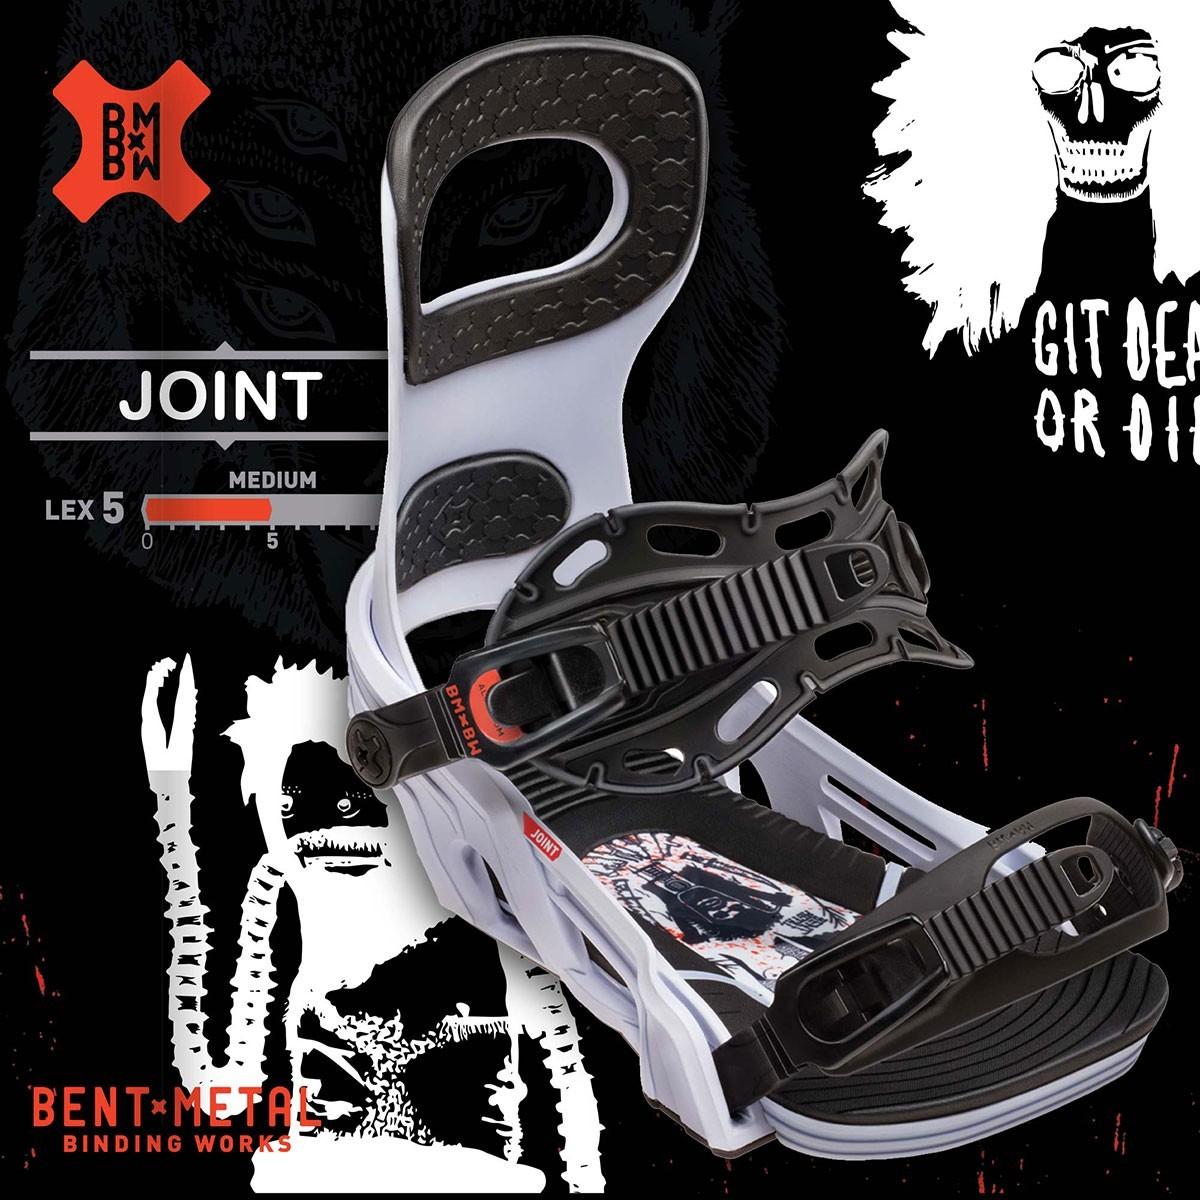 2019 BENT METAL JOINT White - Изображение - AQUAMATRIX